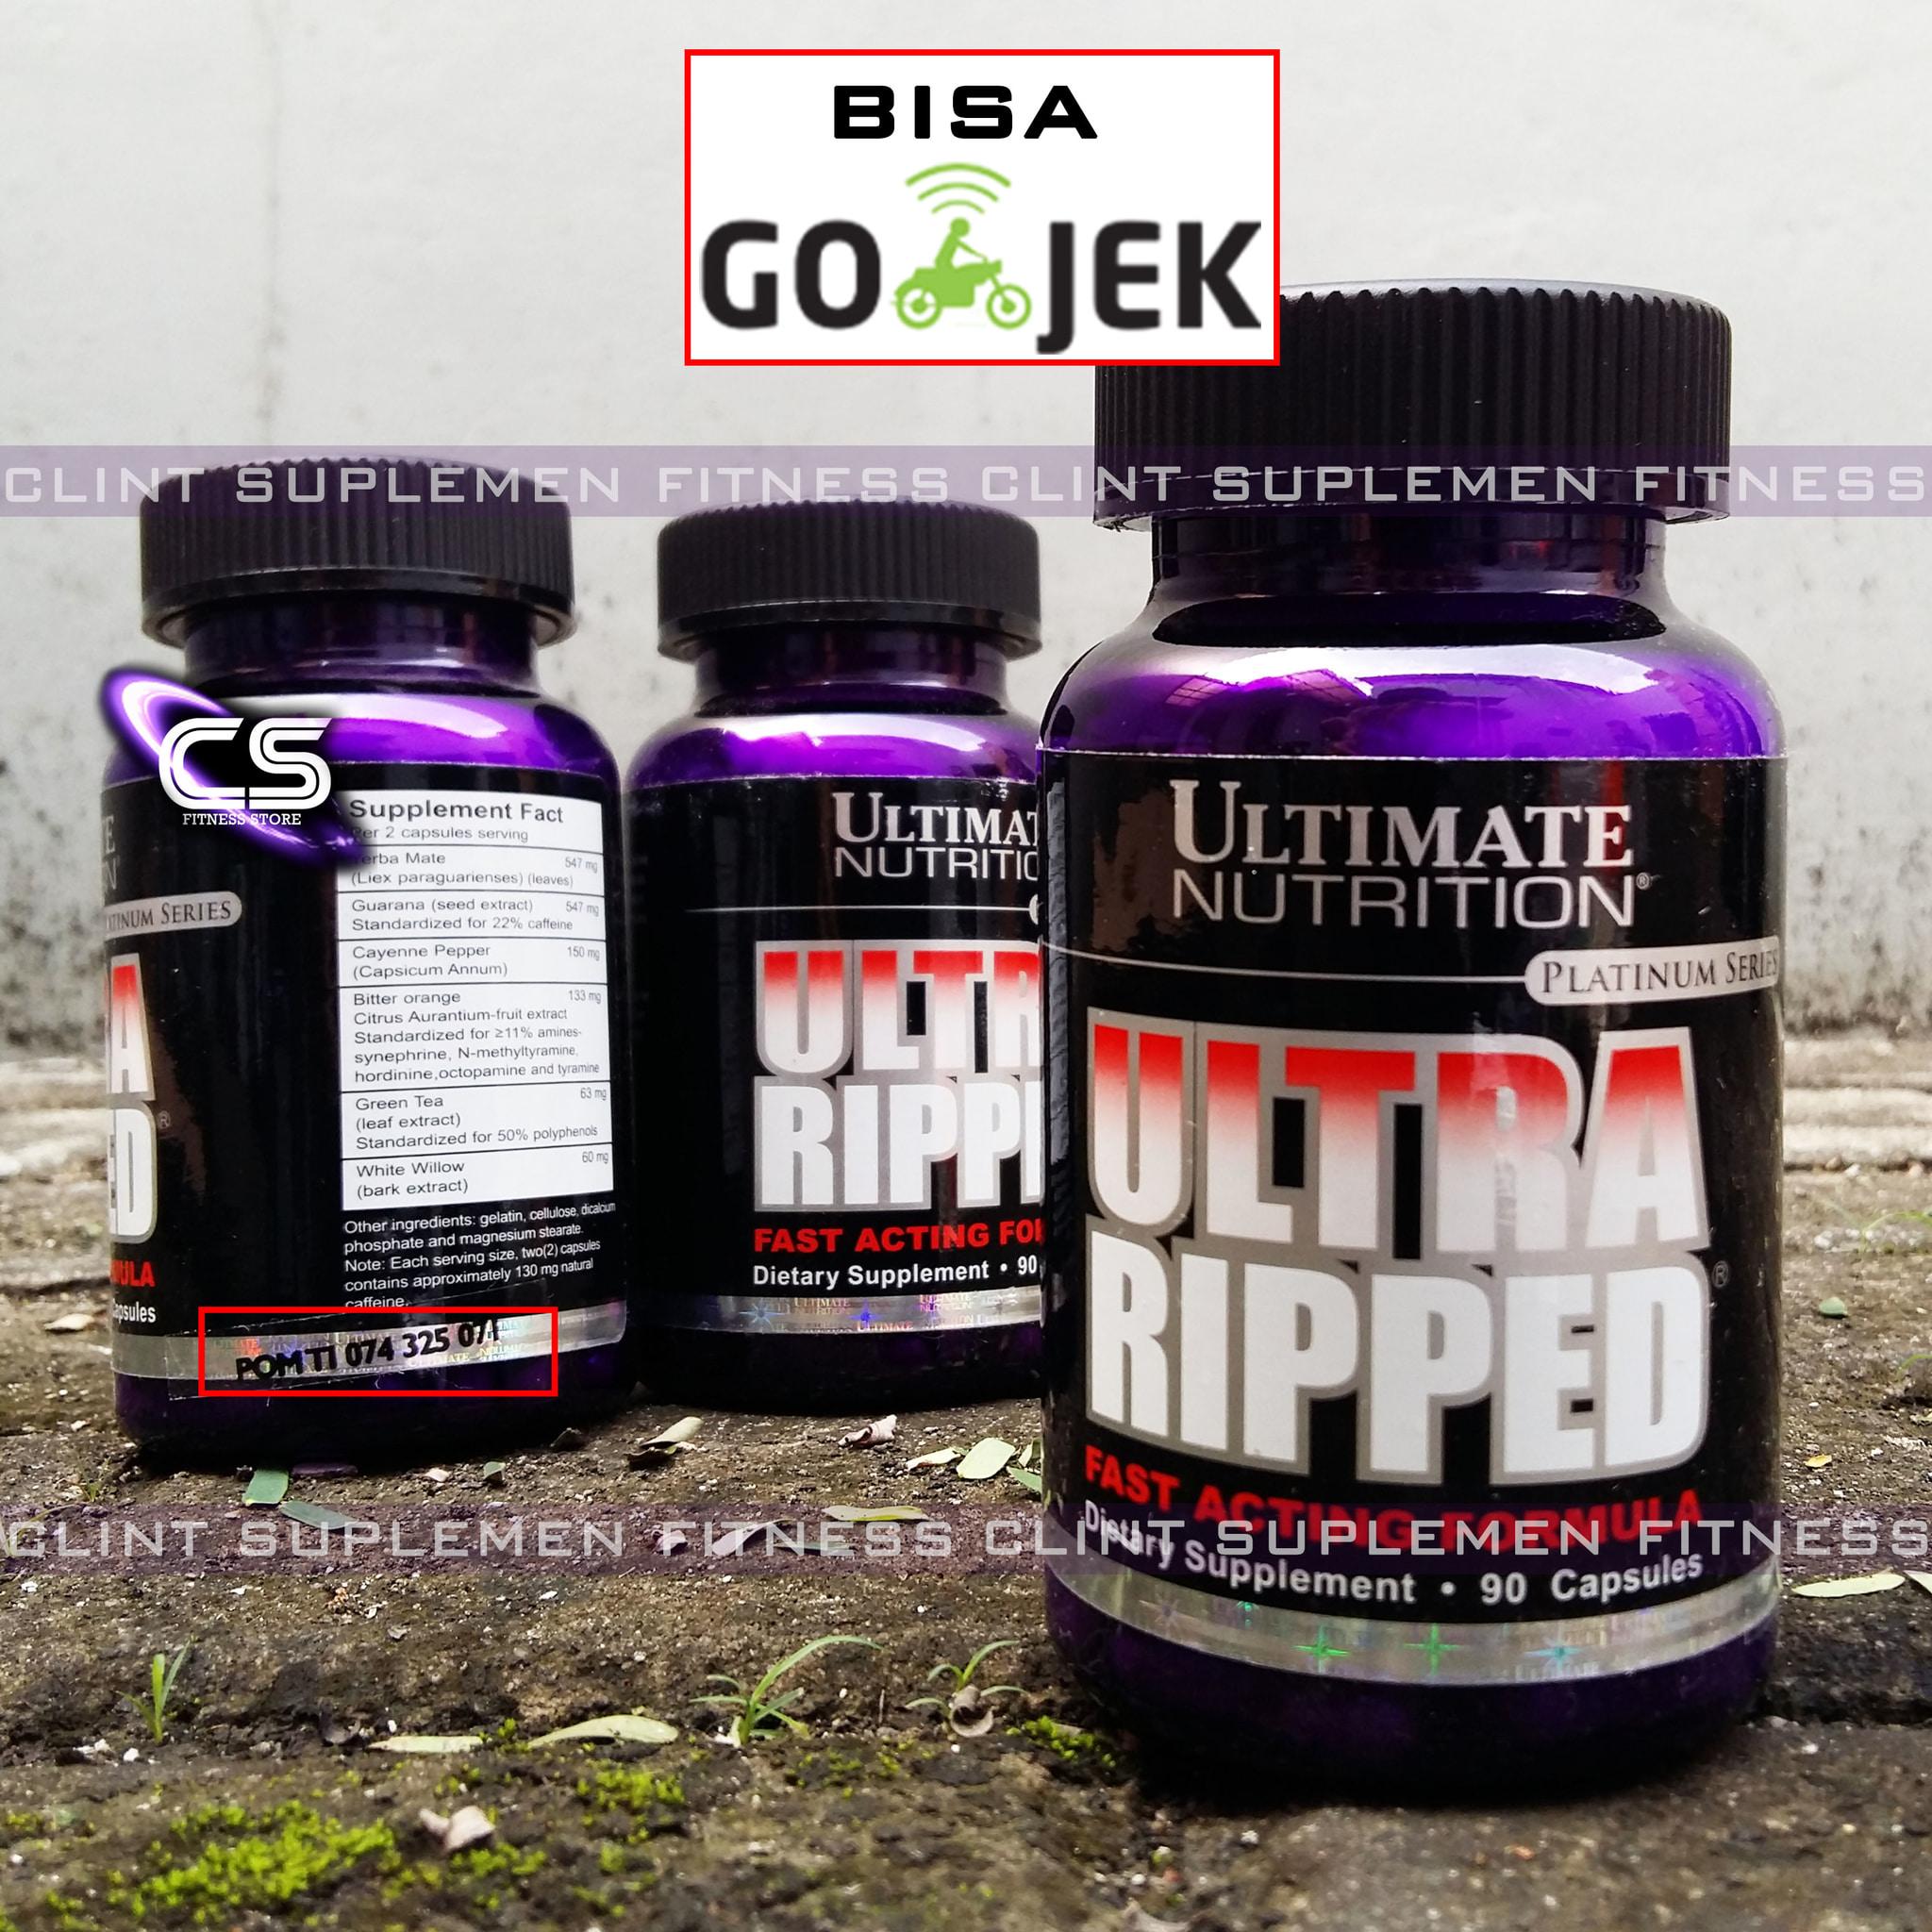 Ultimate Nutrition Ultra Ripped Fast Acting Formula 90caps Daftar Faf 90 Caps Capsul 180 Capsules Source Un